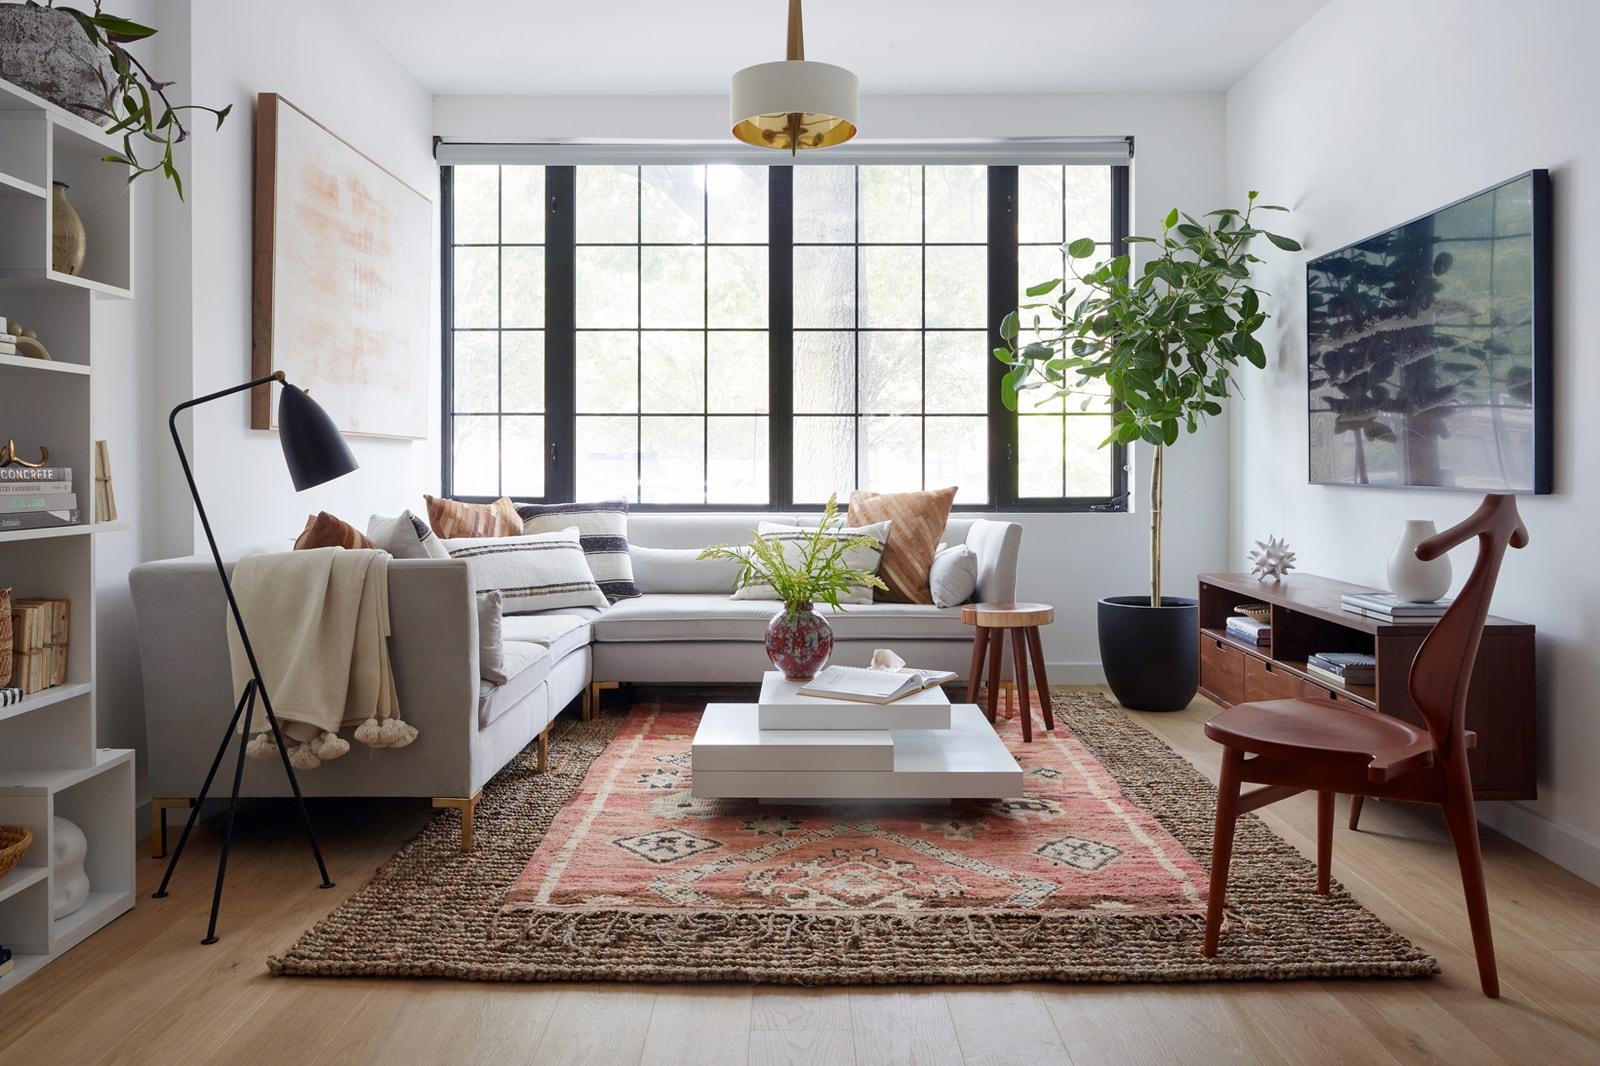 Living Room Interior Design Home Mid Century Modern Furniture Fireplace